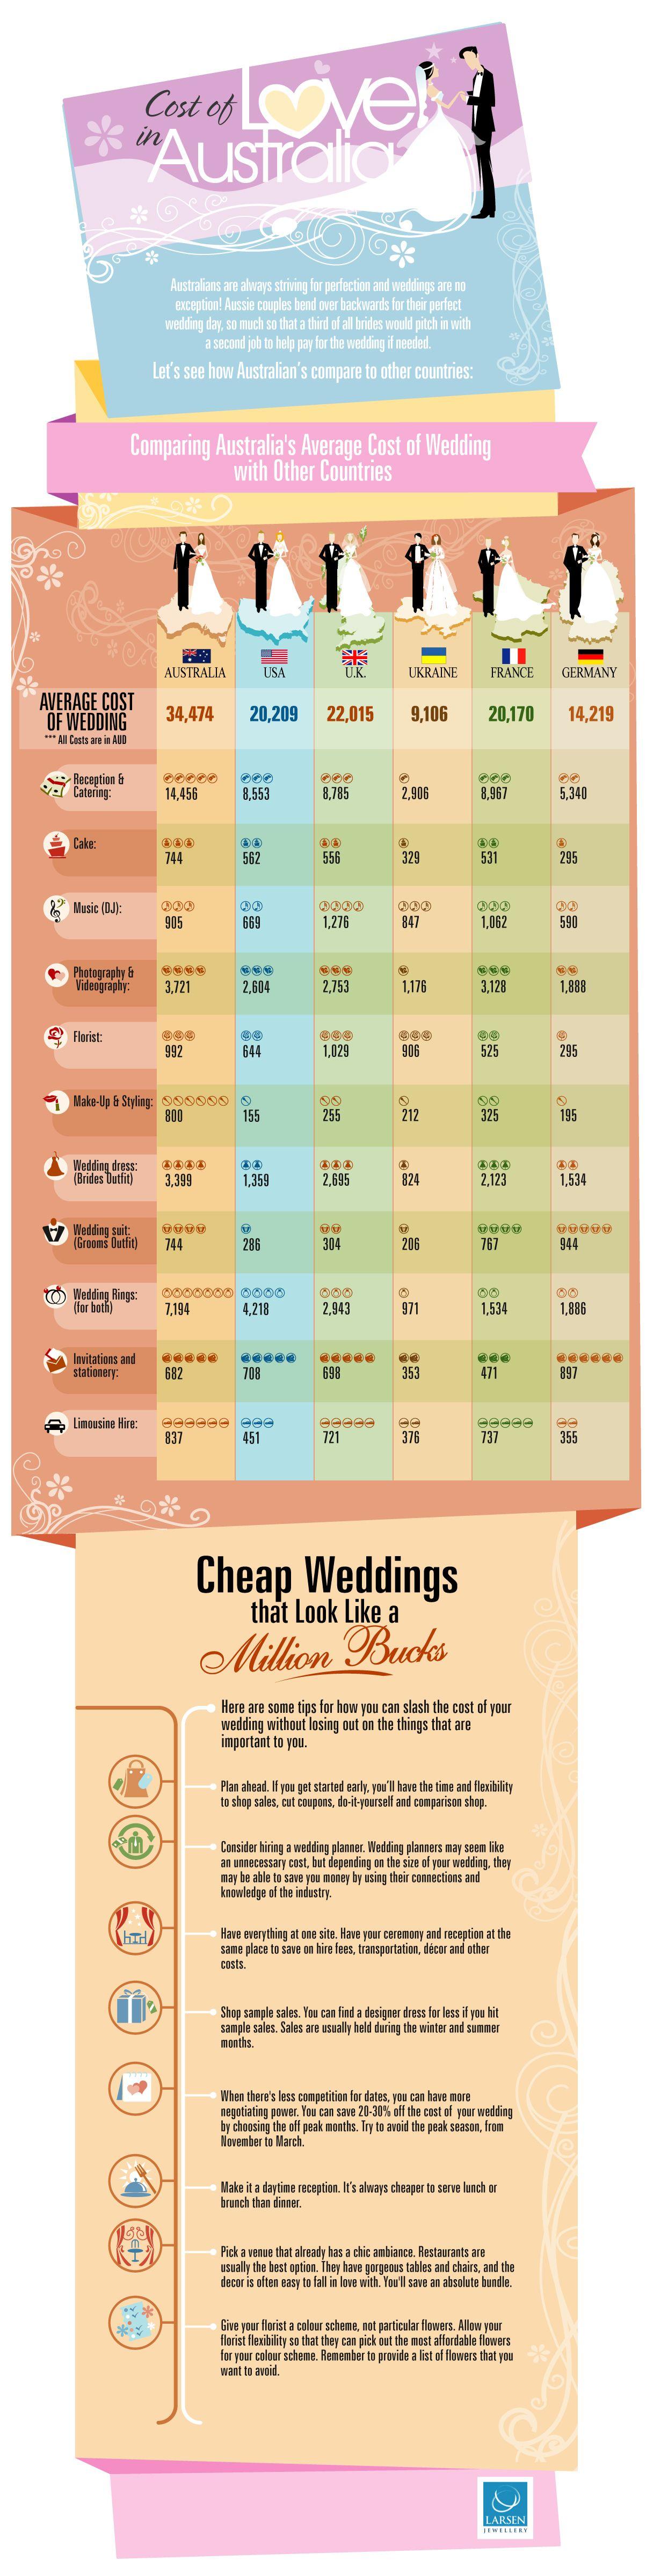 Average wedding cost australia